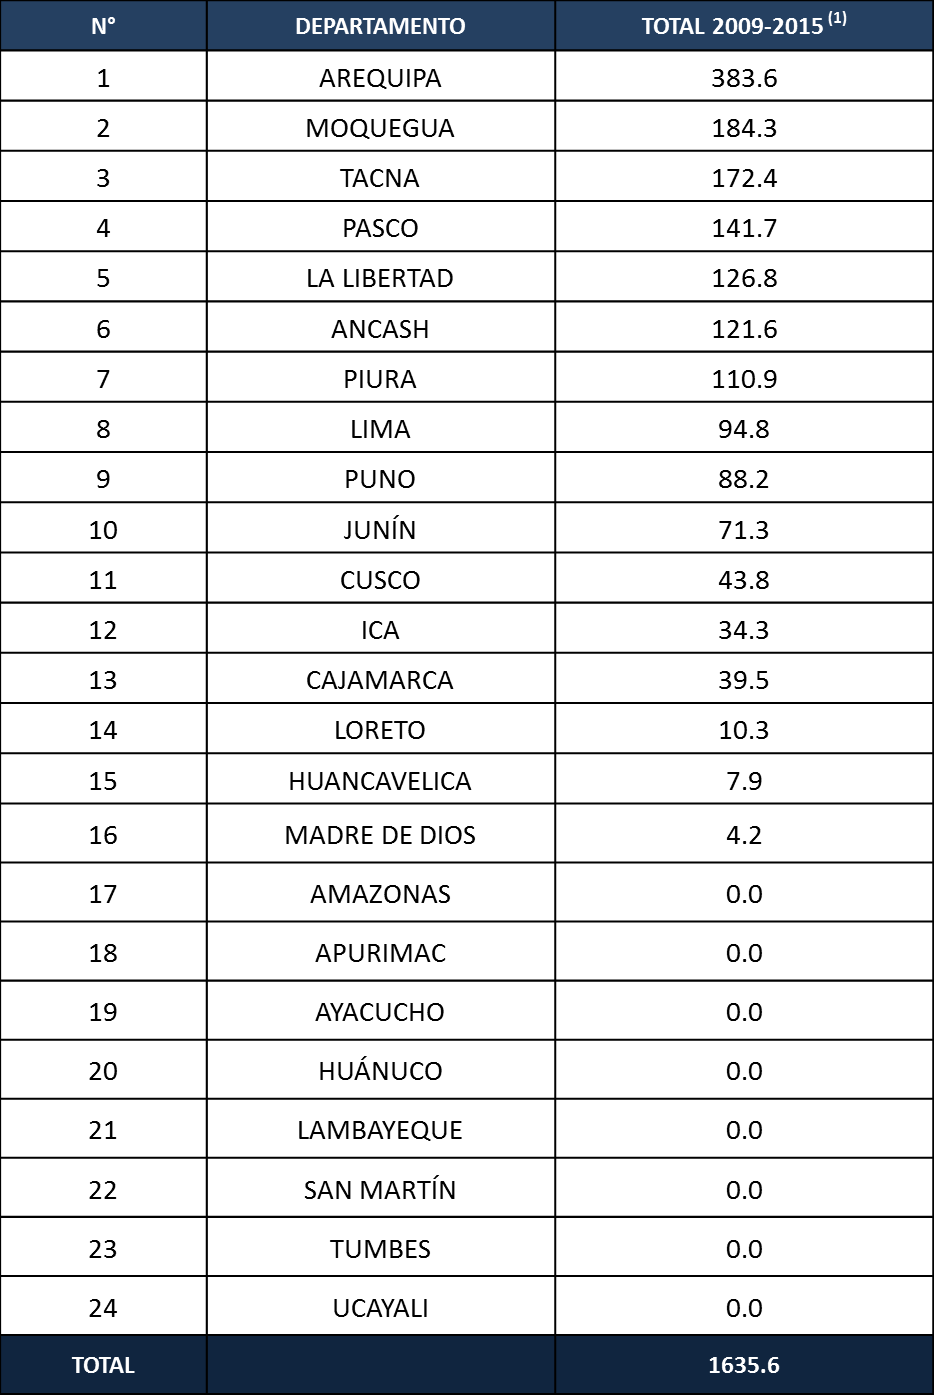 Ranking por departamentos OxI